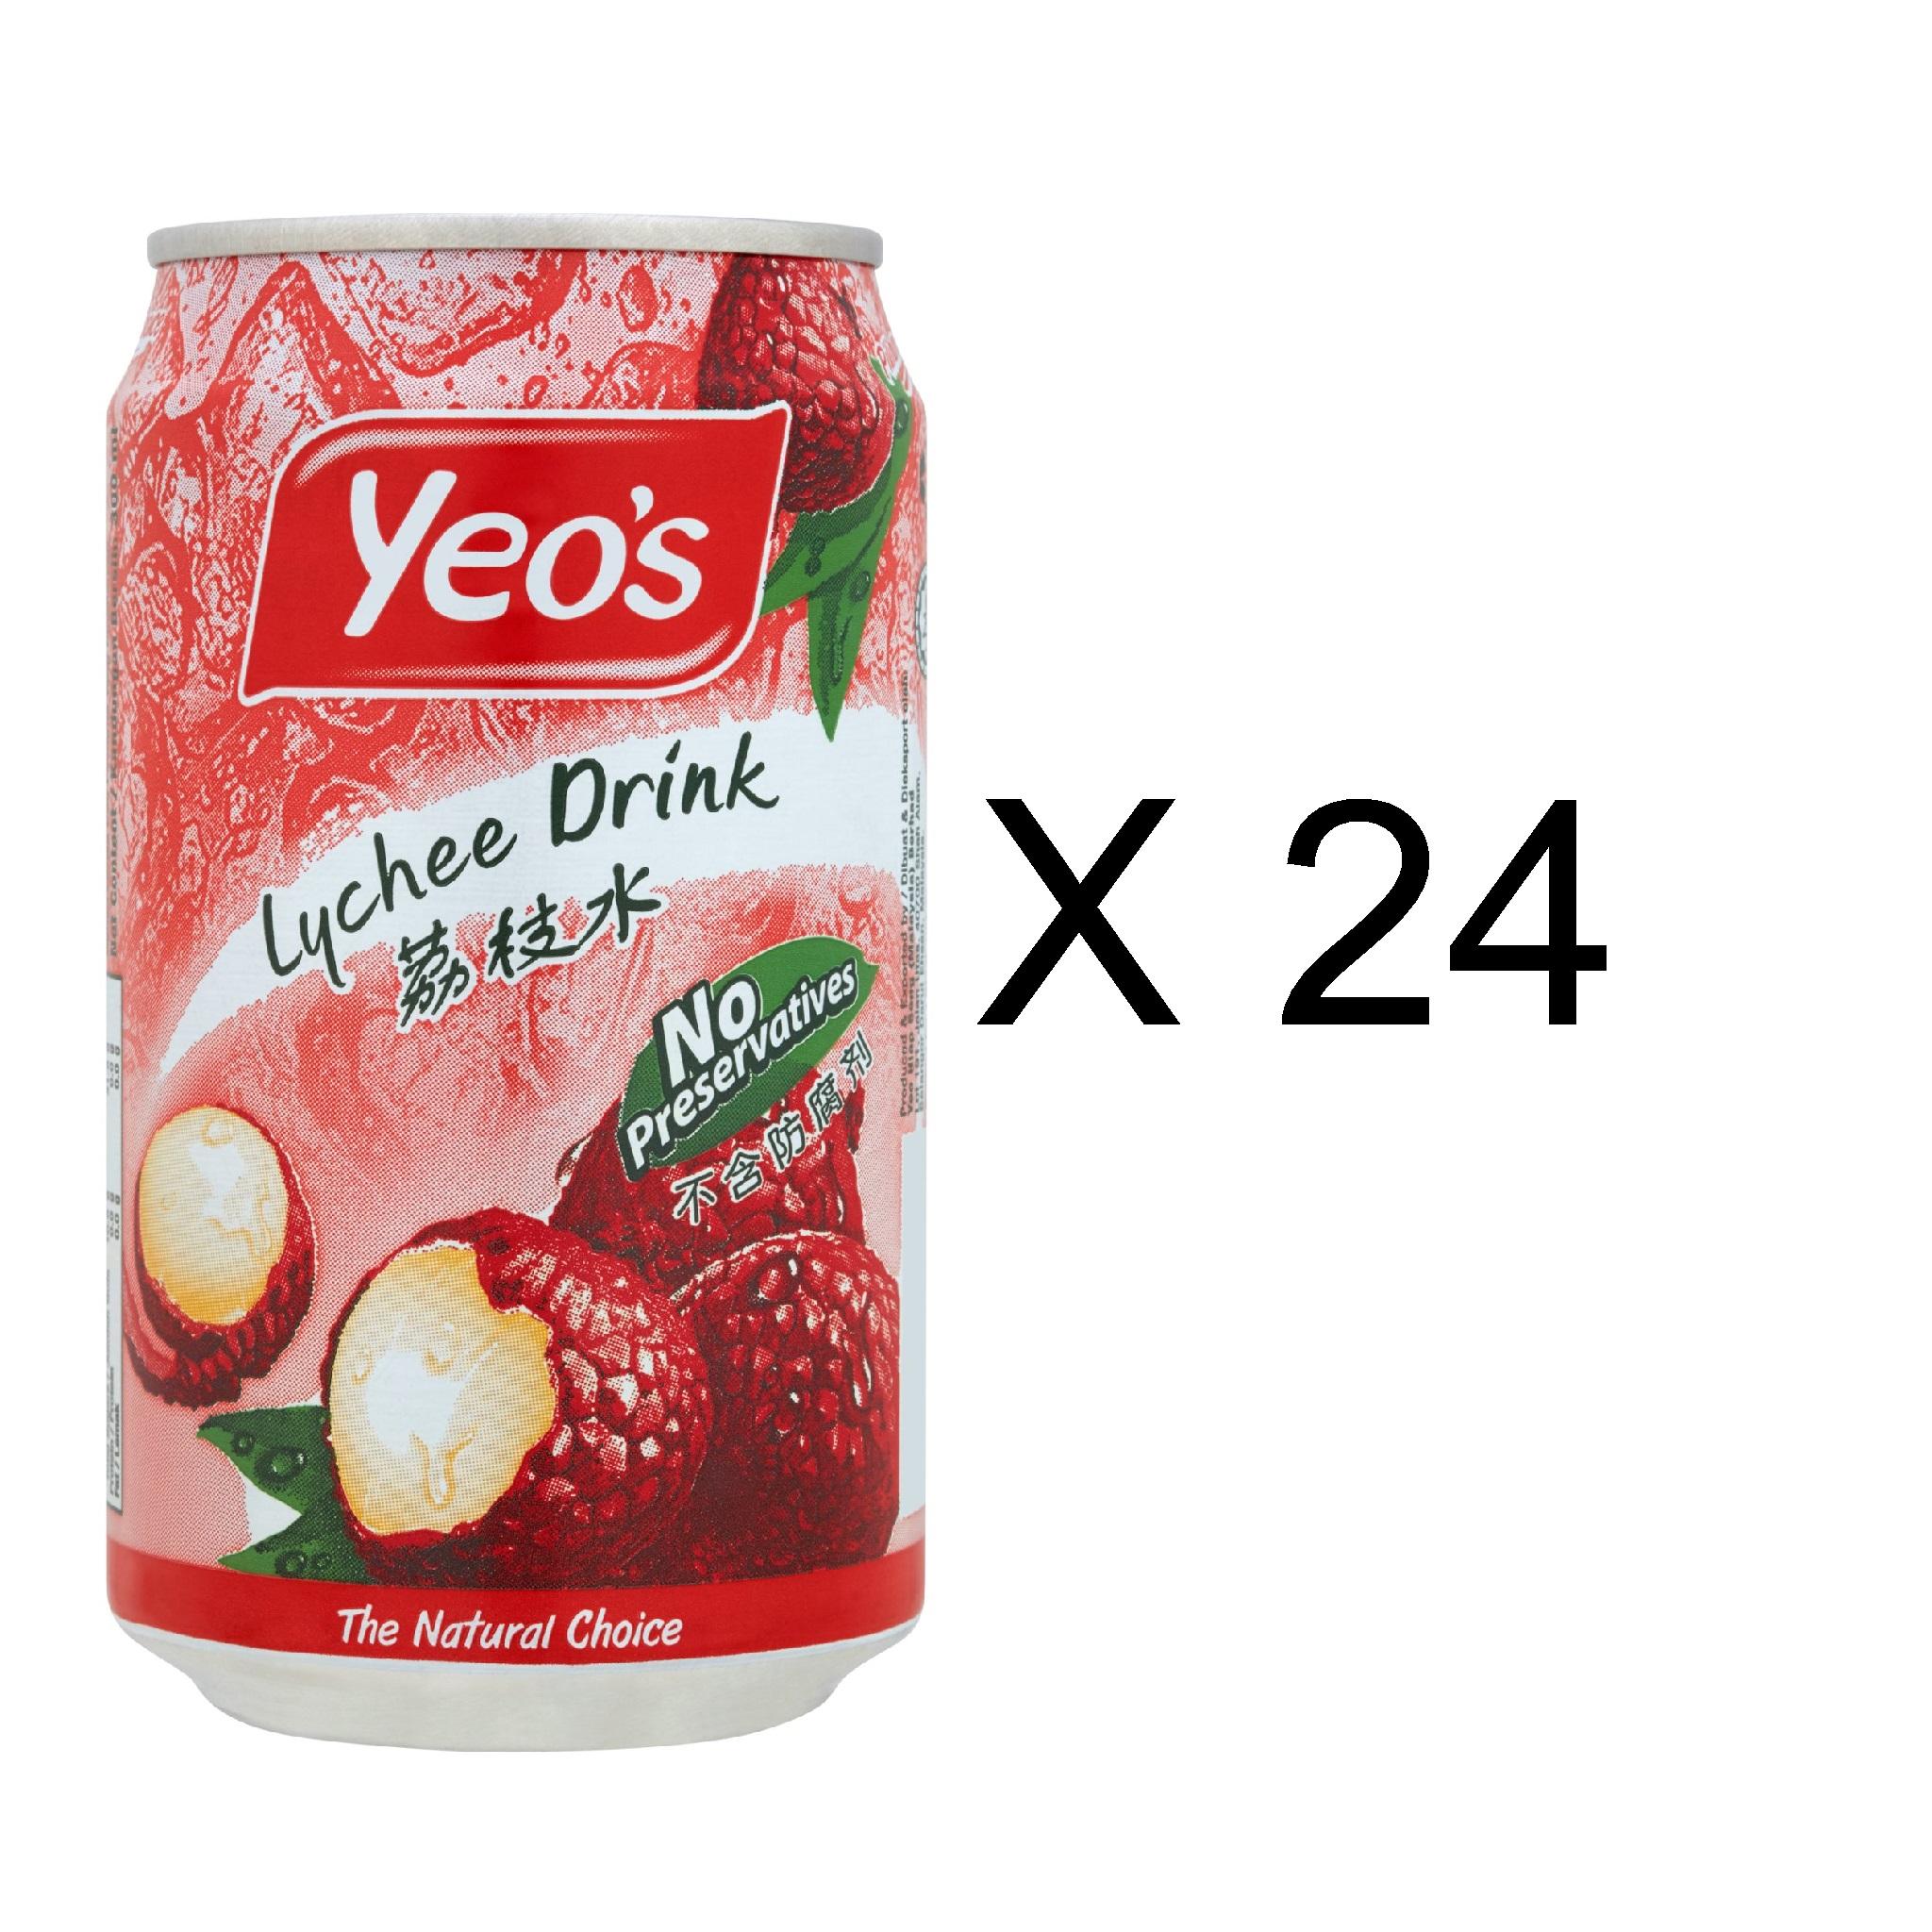 Yeo's Lychee Drink (24 x 300ml)